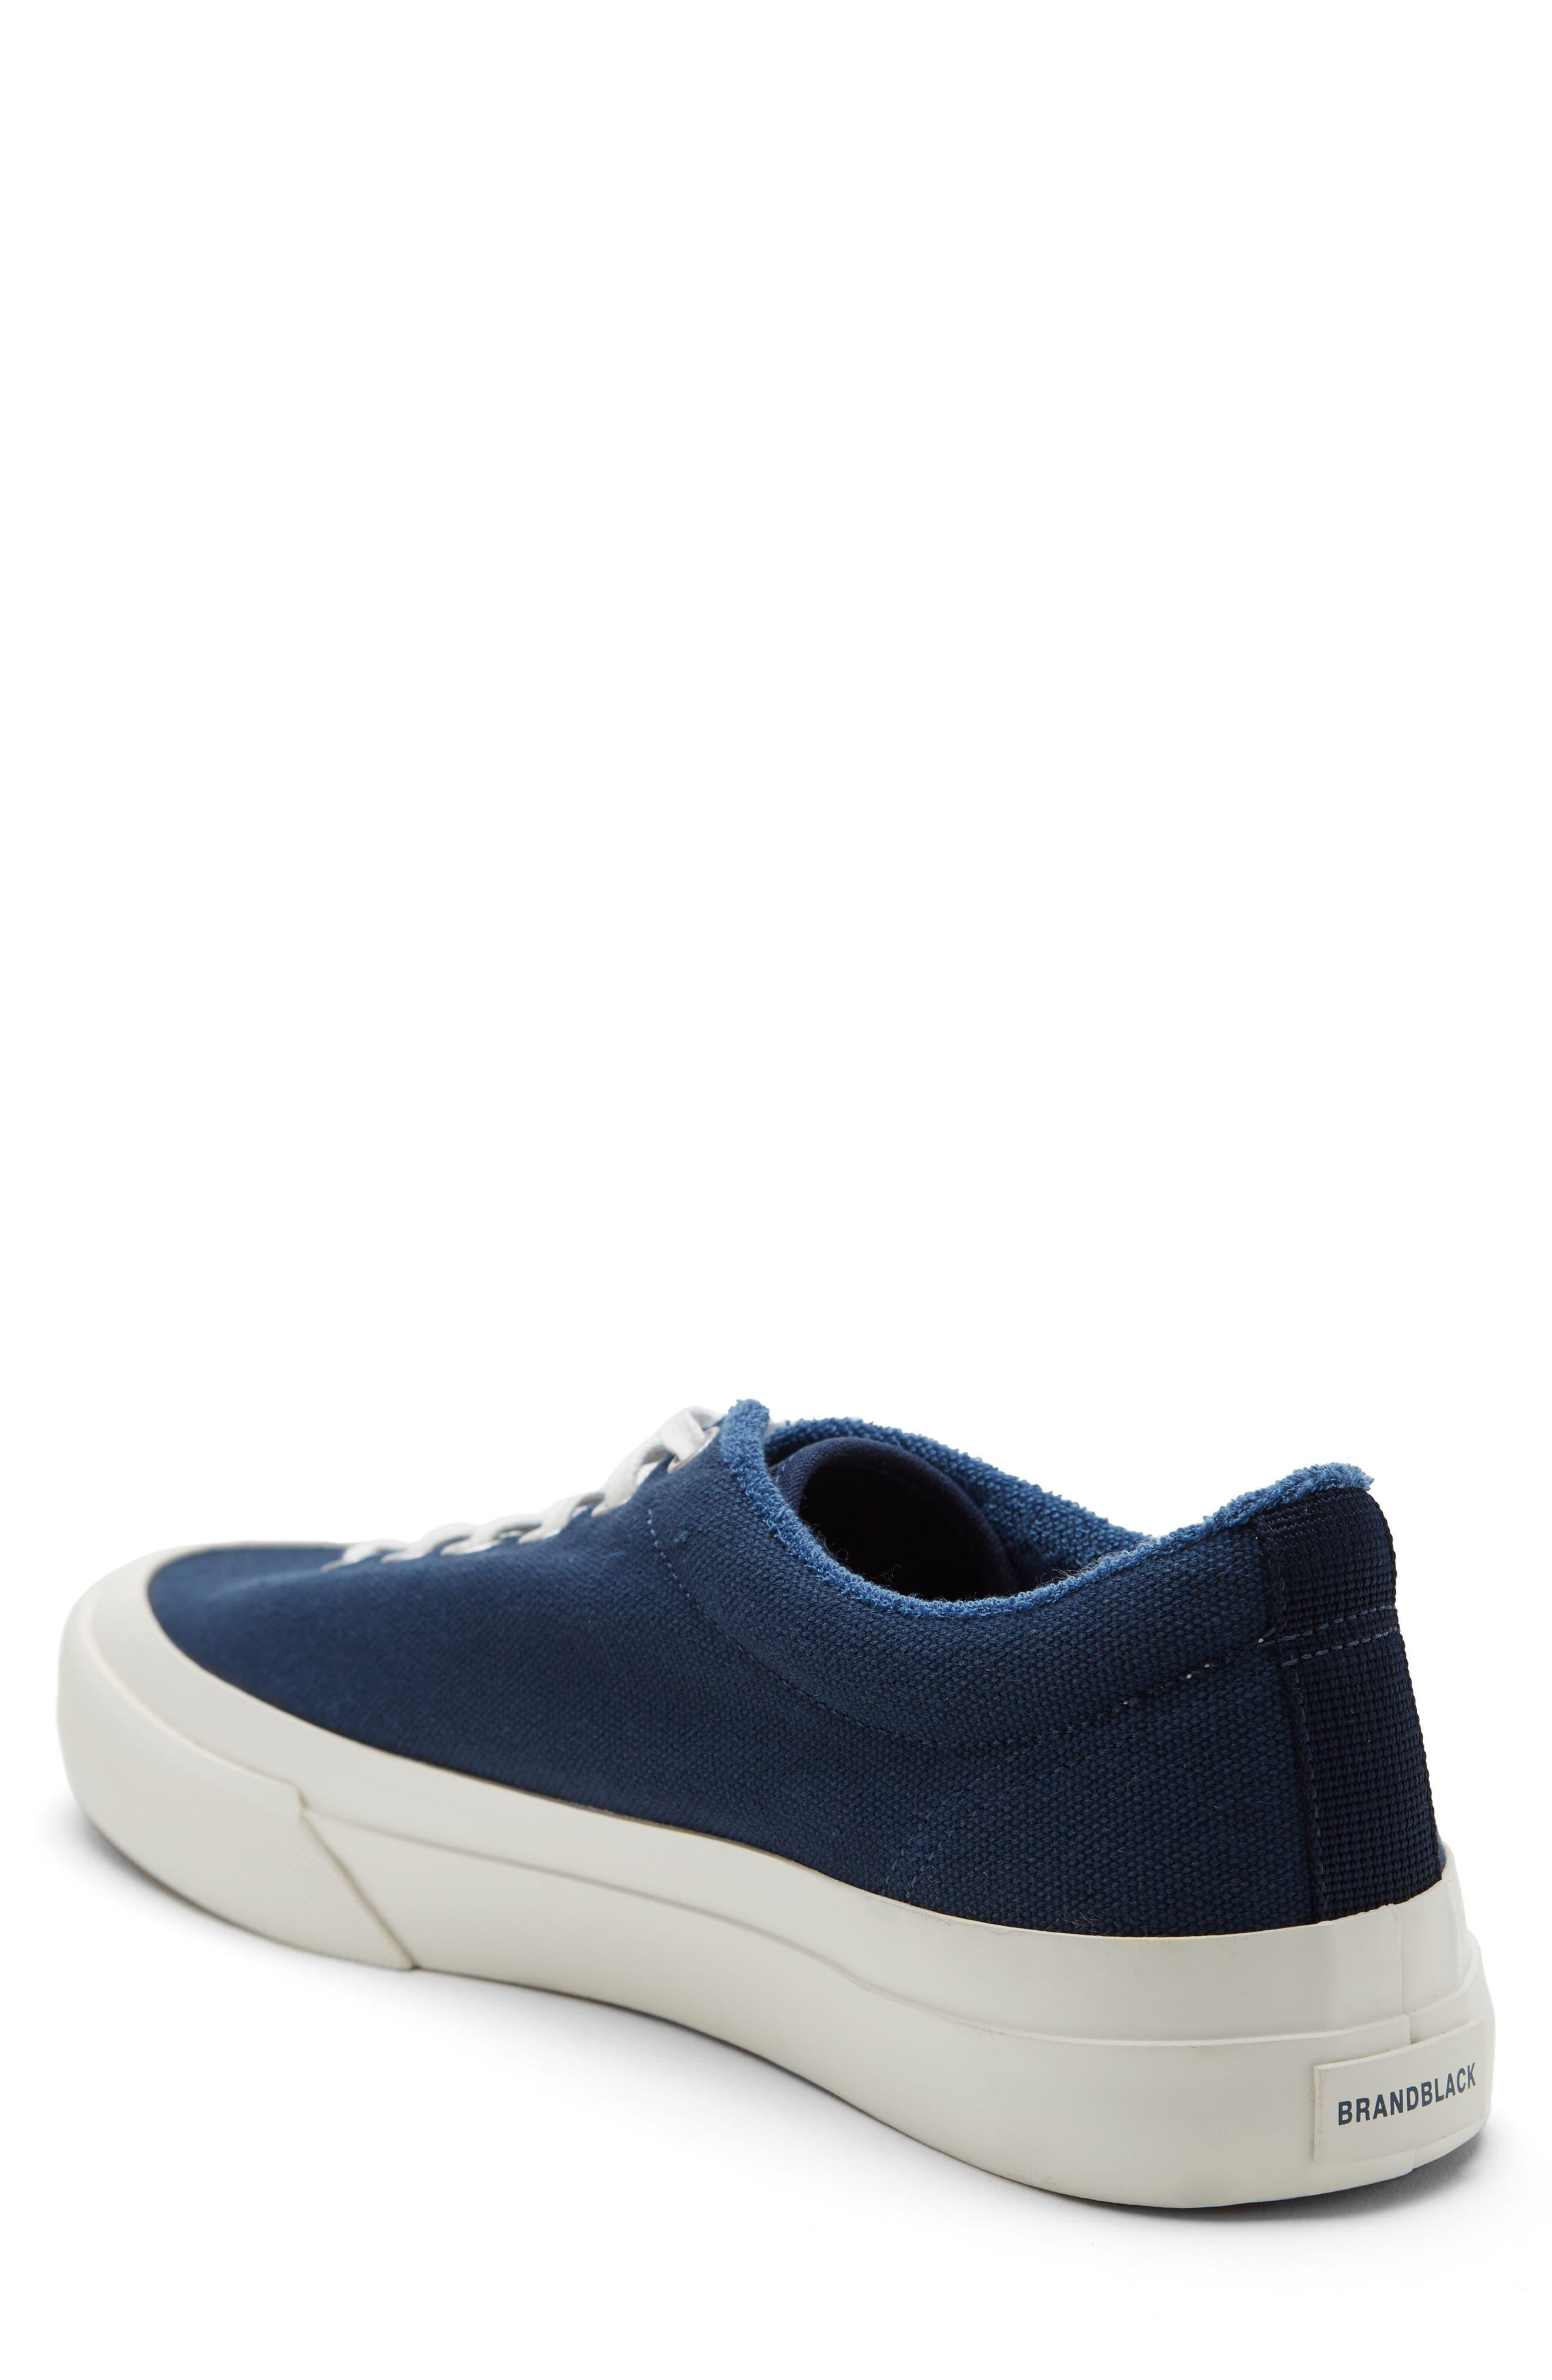 Vesta Low Top Sneaker,                             Alternate thumbnail 2, color,                             Navy